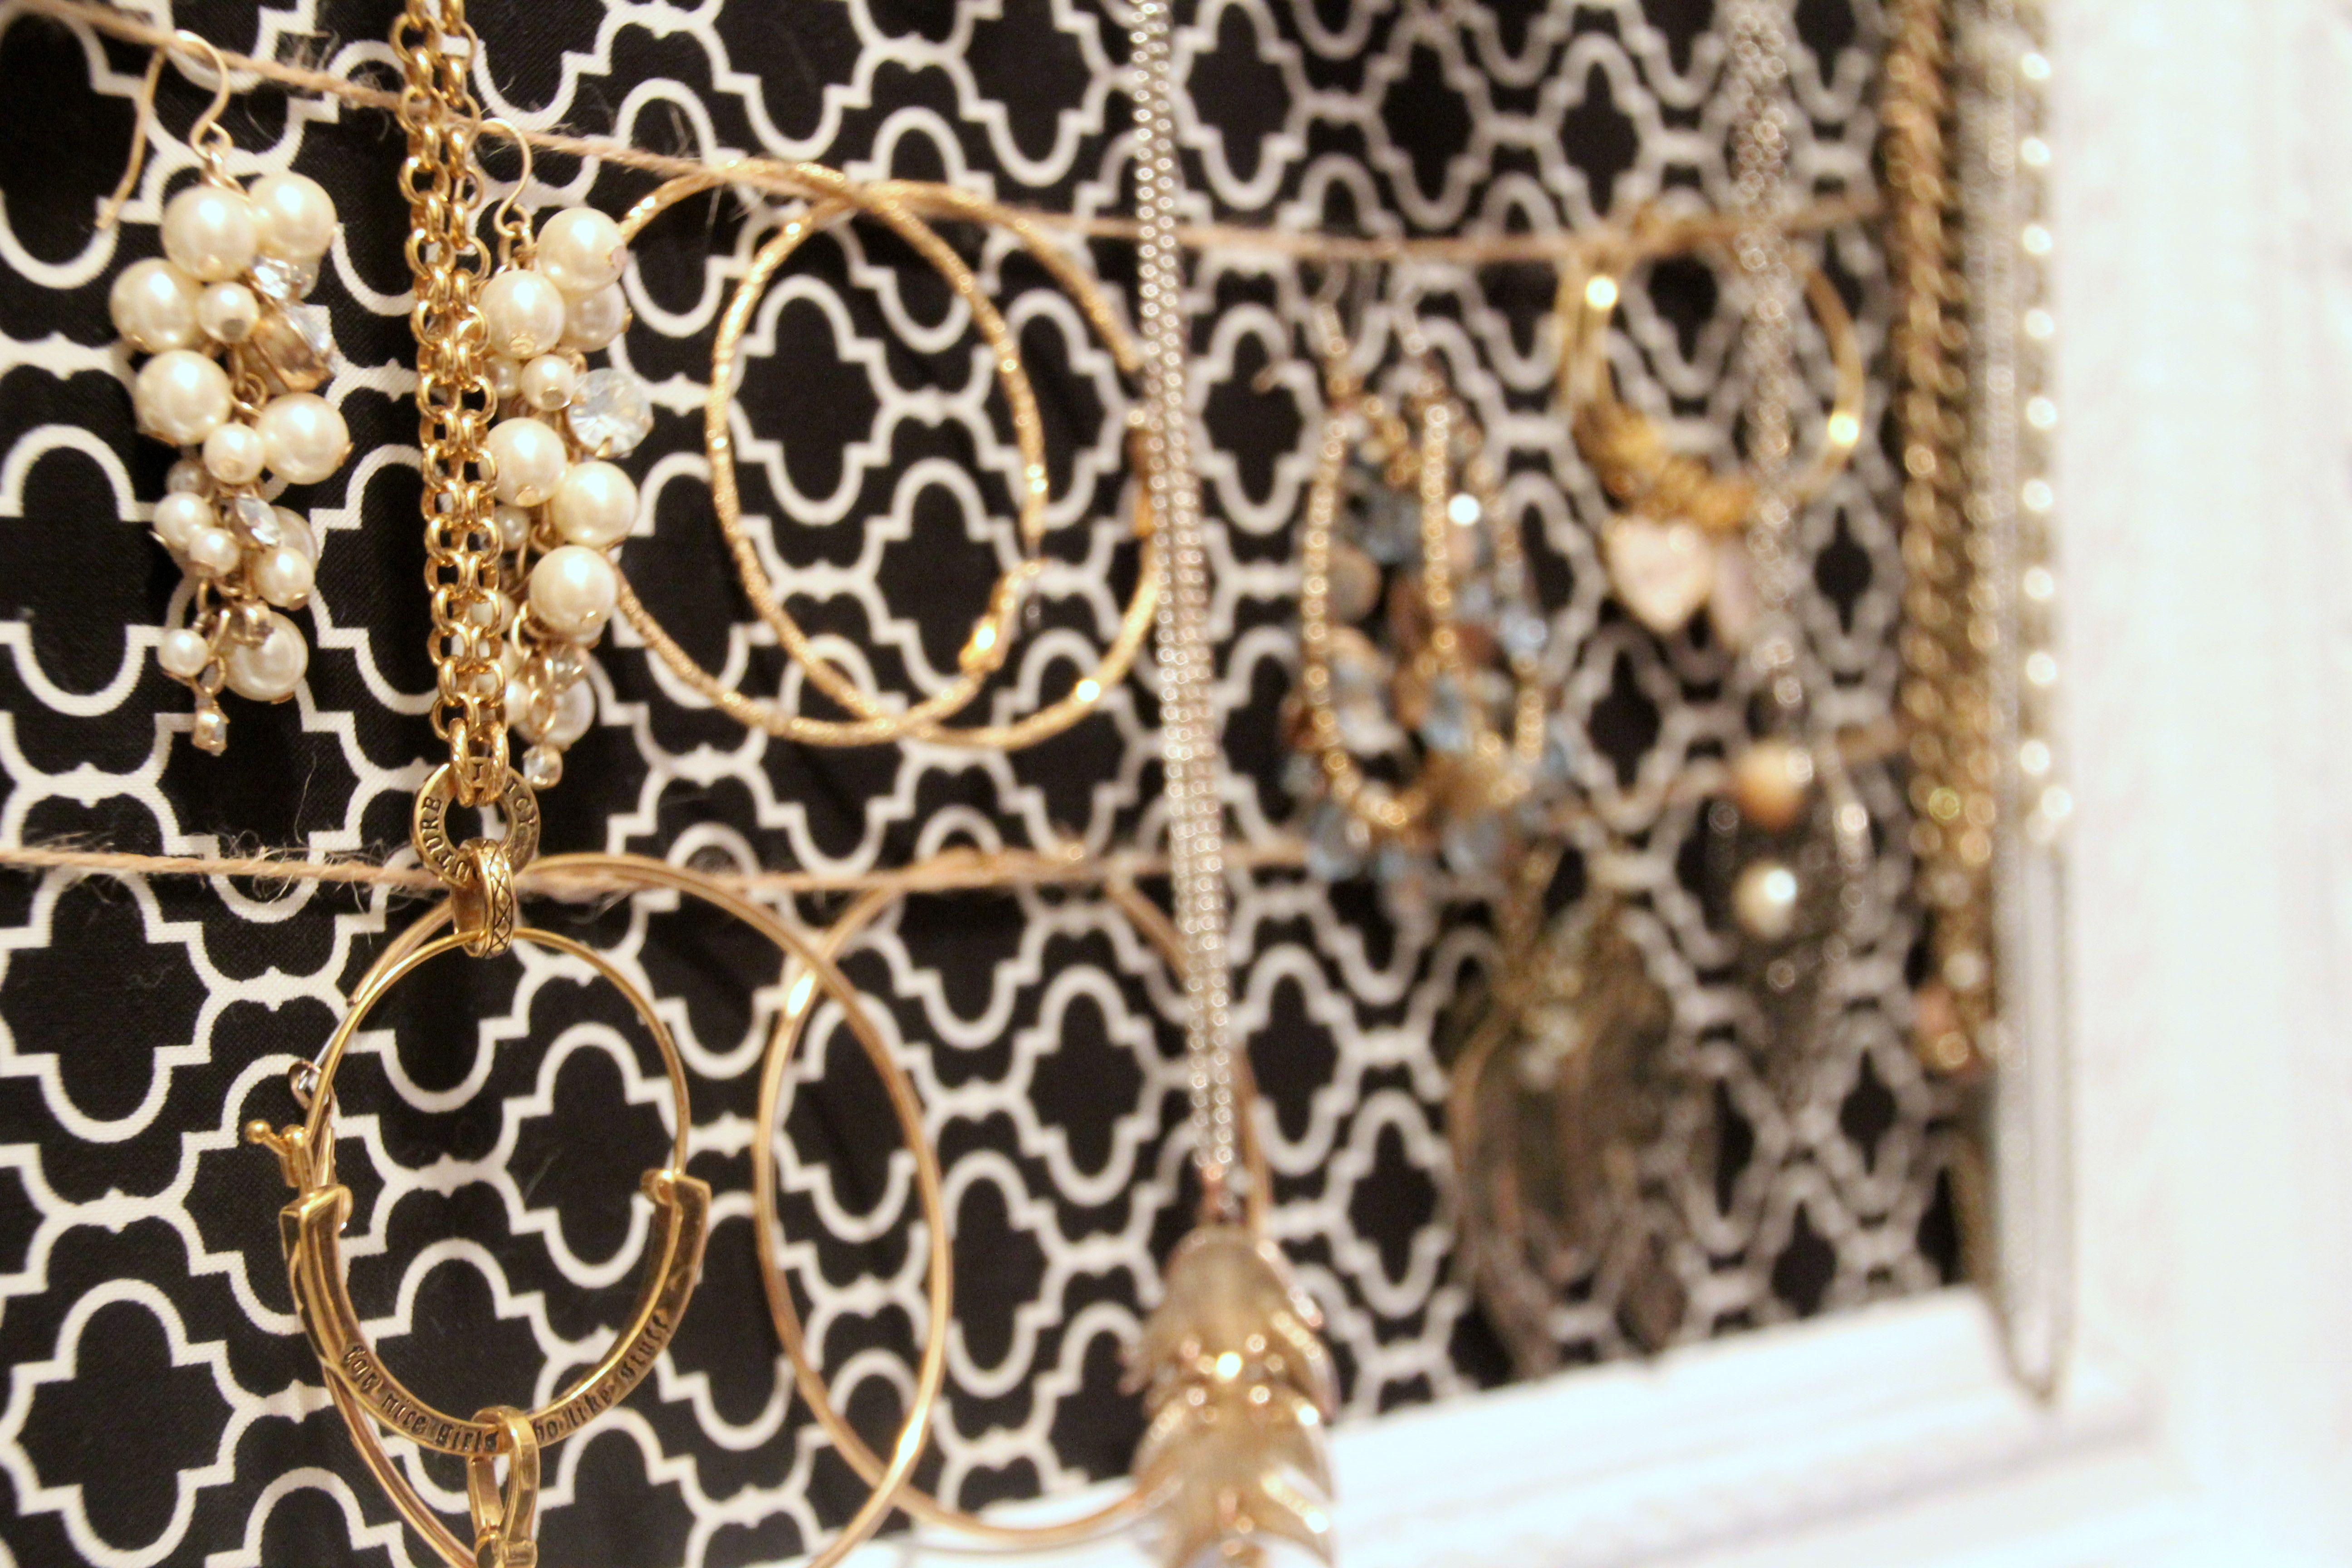 Jewelry Frame - Ez Peasy Take frame, paint/etc, attach fabric ...